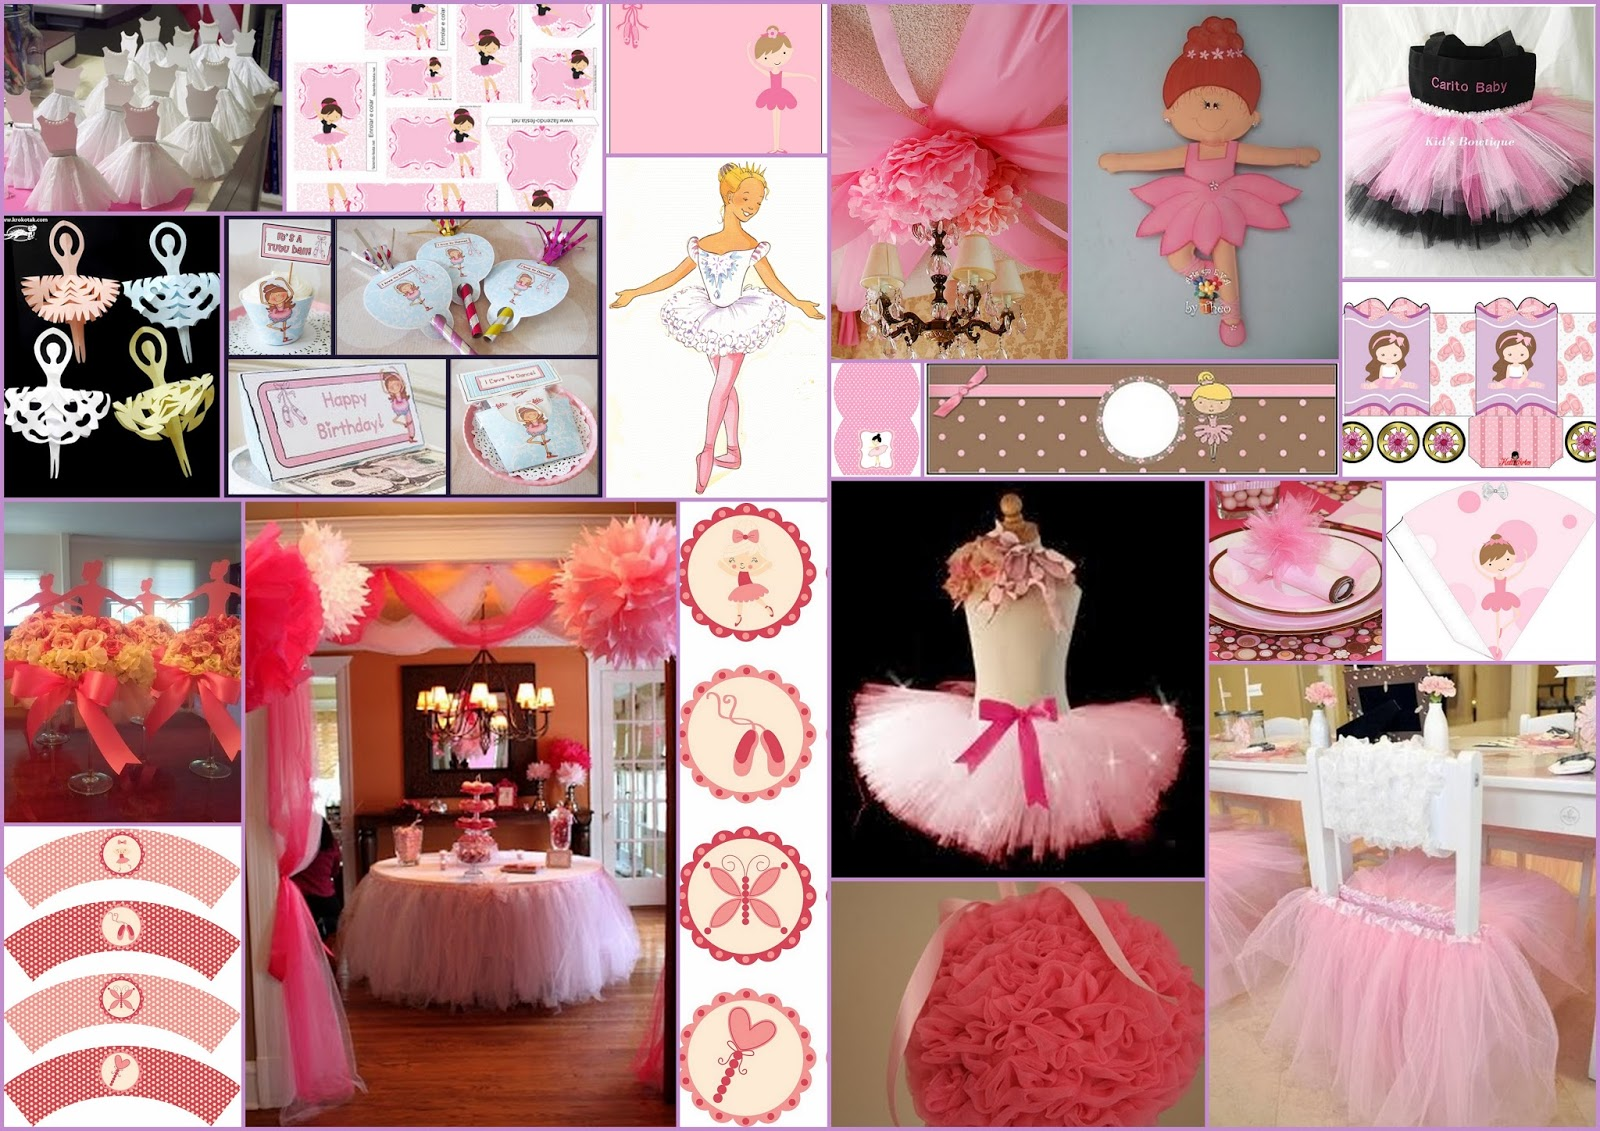 15 a os de ballet decoraci n kits para imprimir gratis for Decoracion de pared para quinceanera